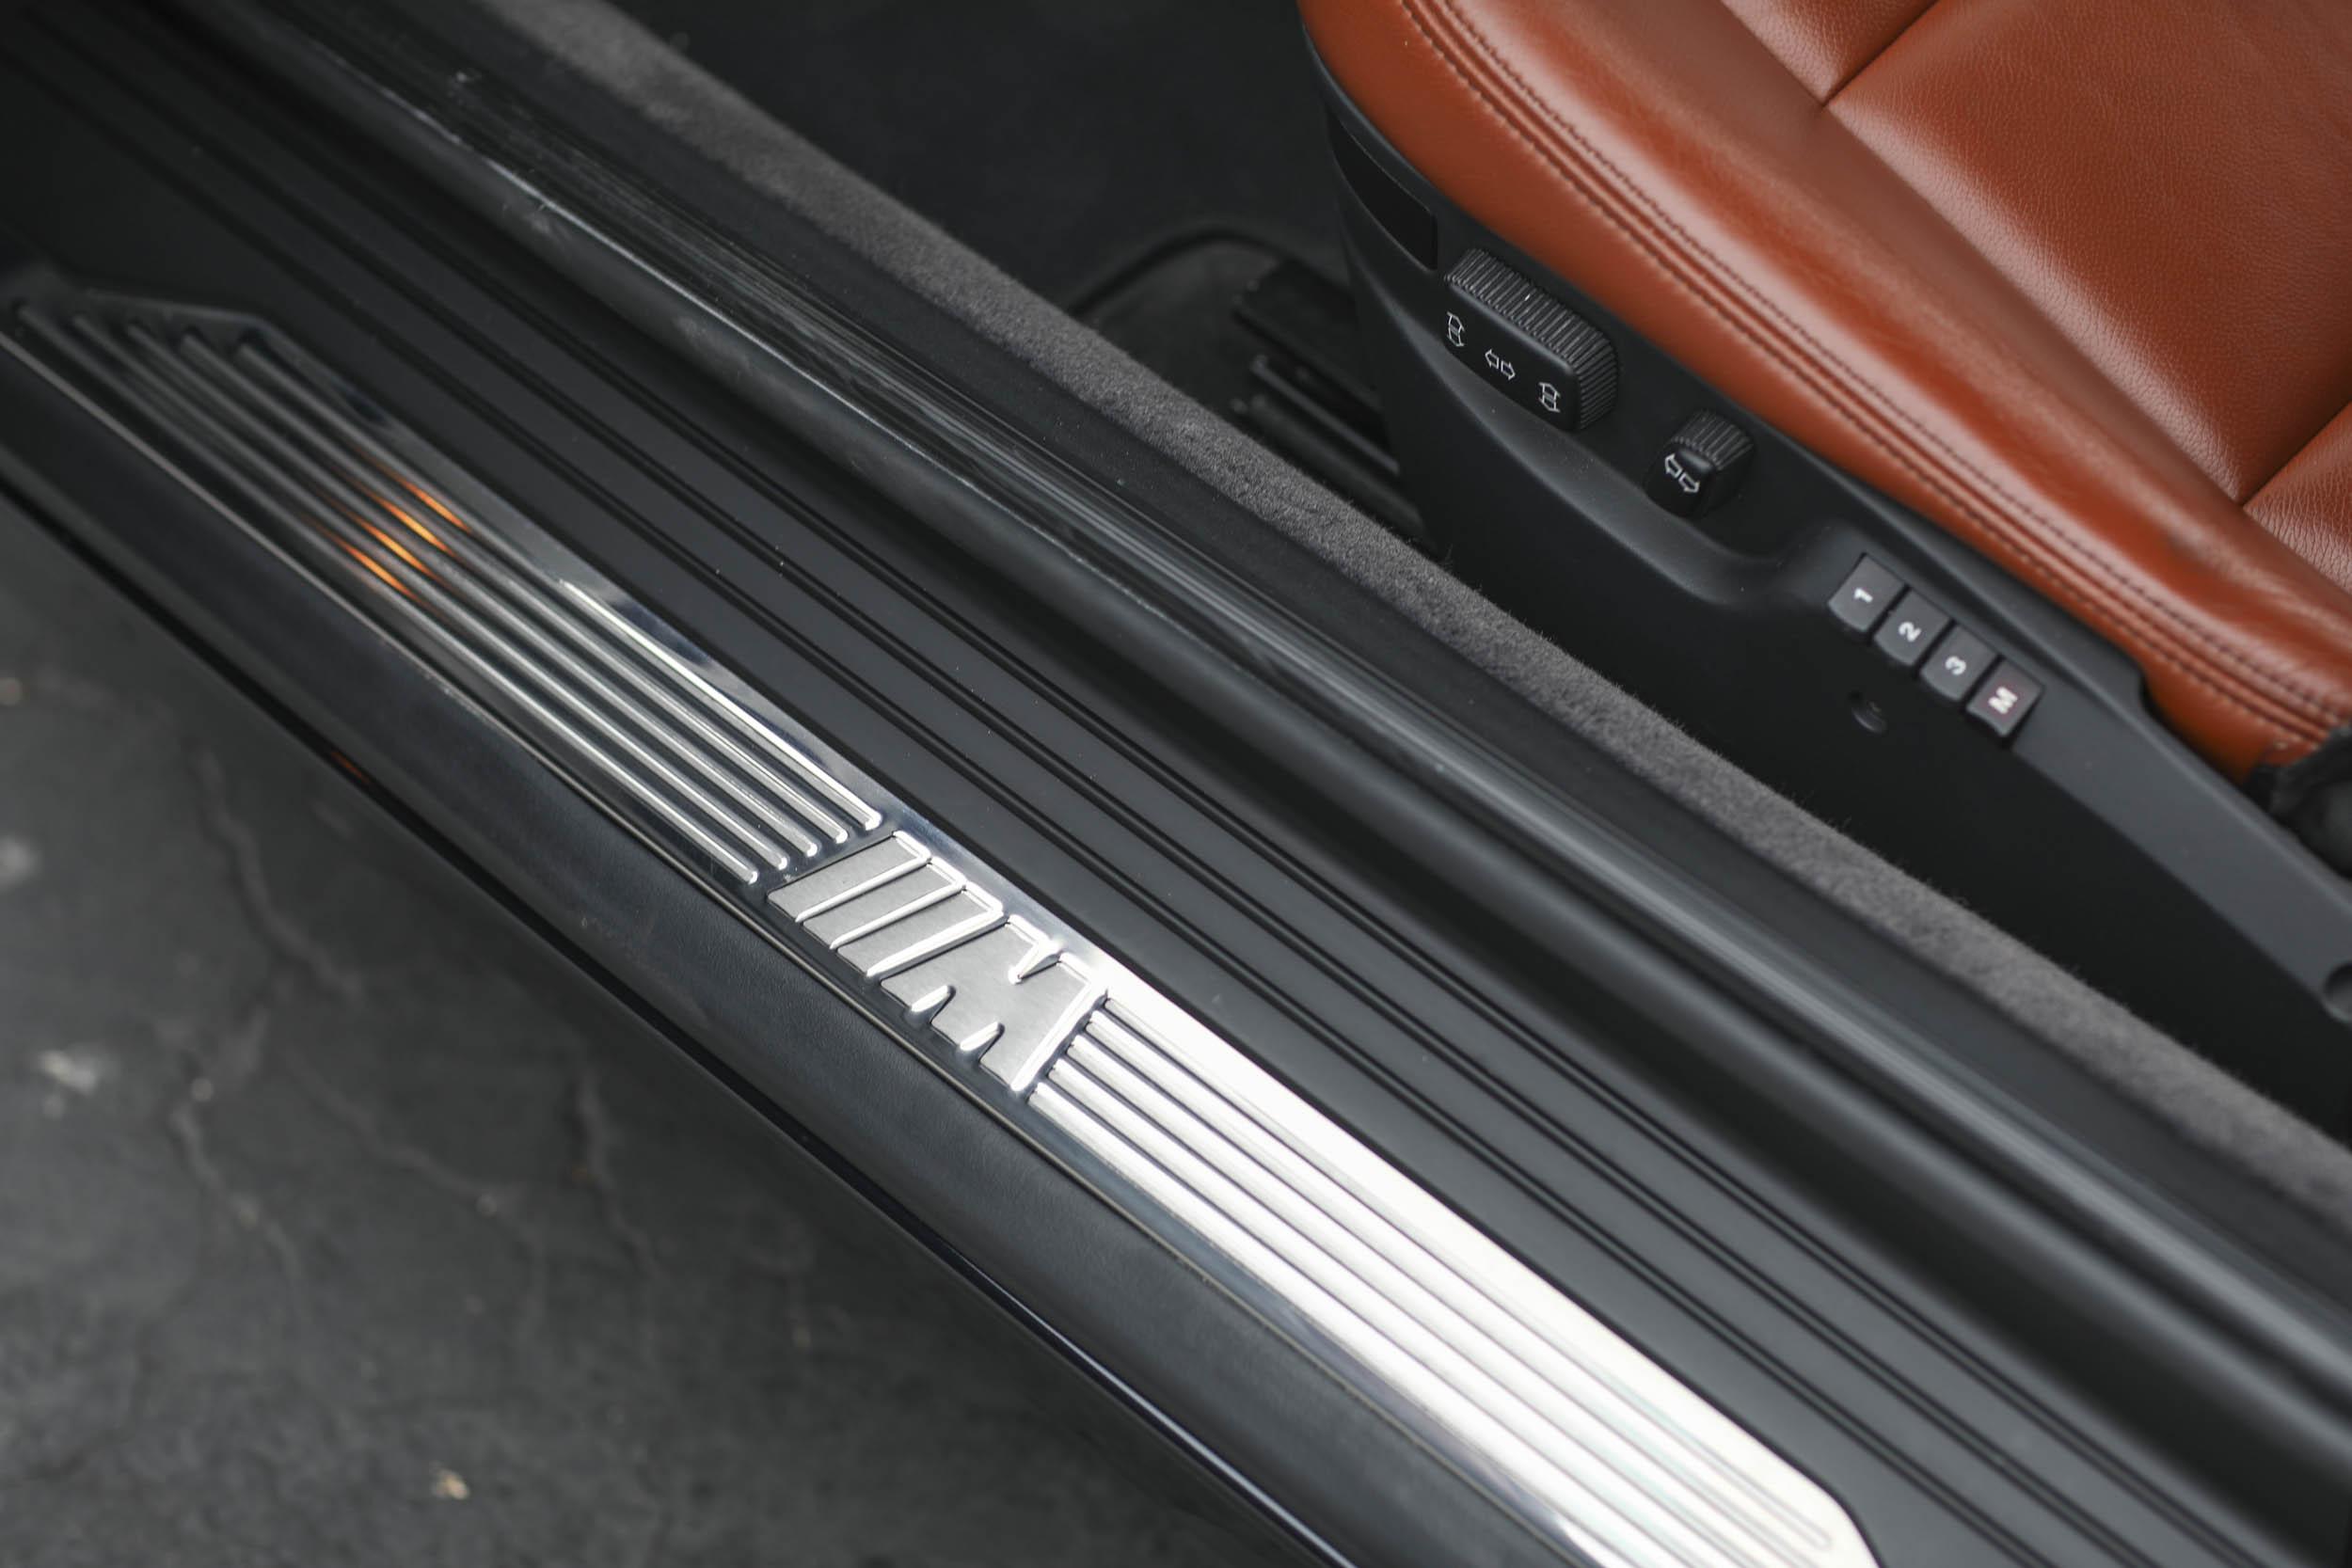 1993 BMW 850Ci running board detail